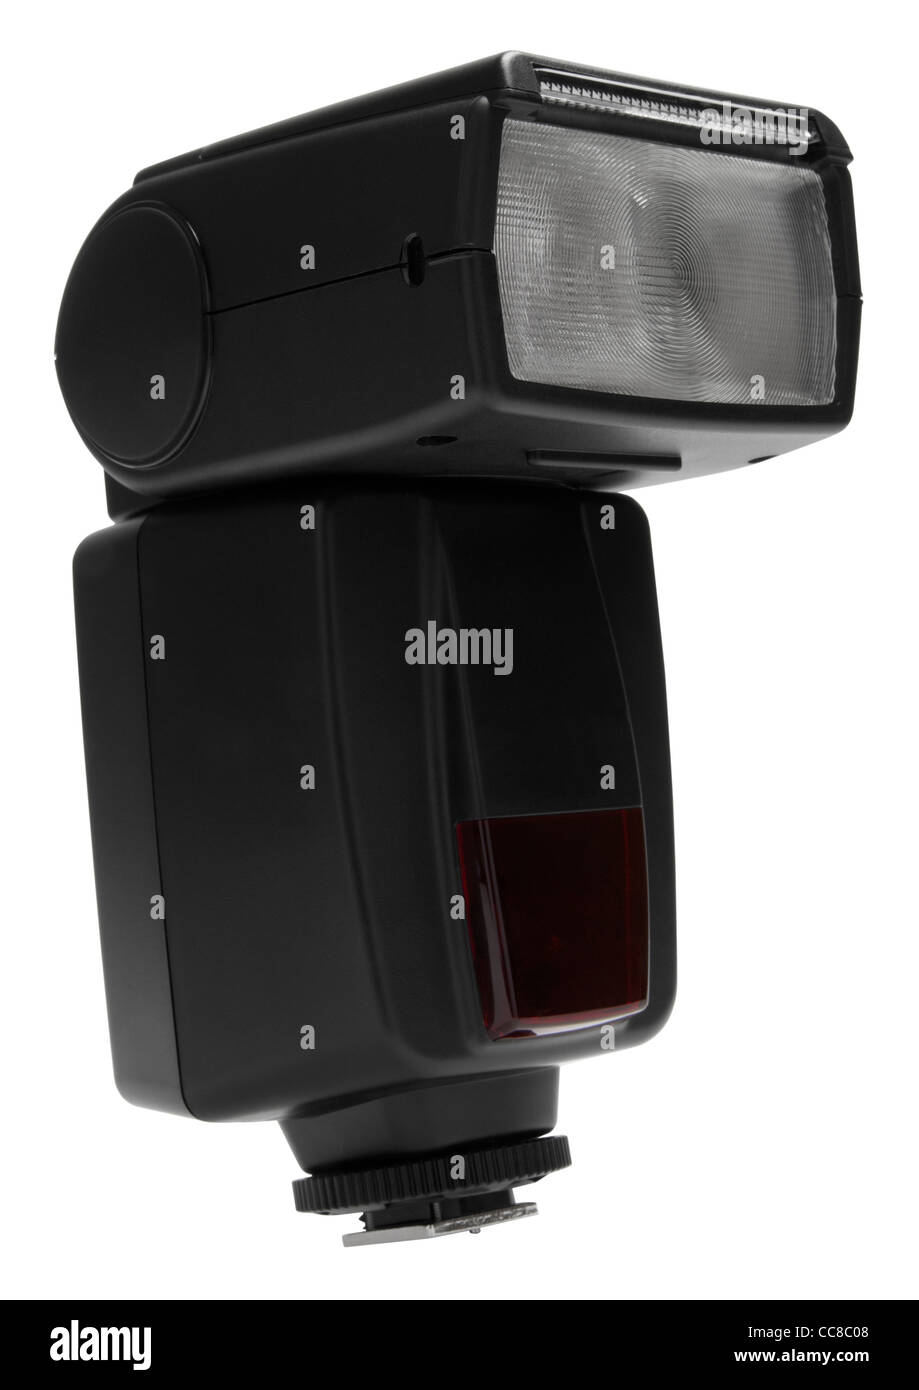 Camera flash speedlite strobe on white background - Stock Image